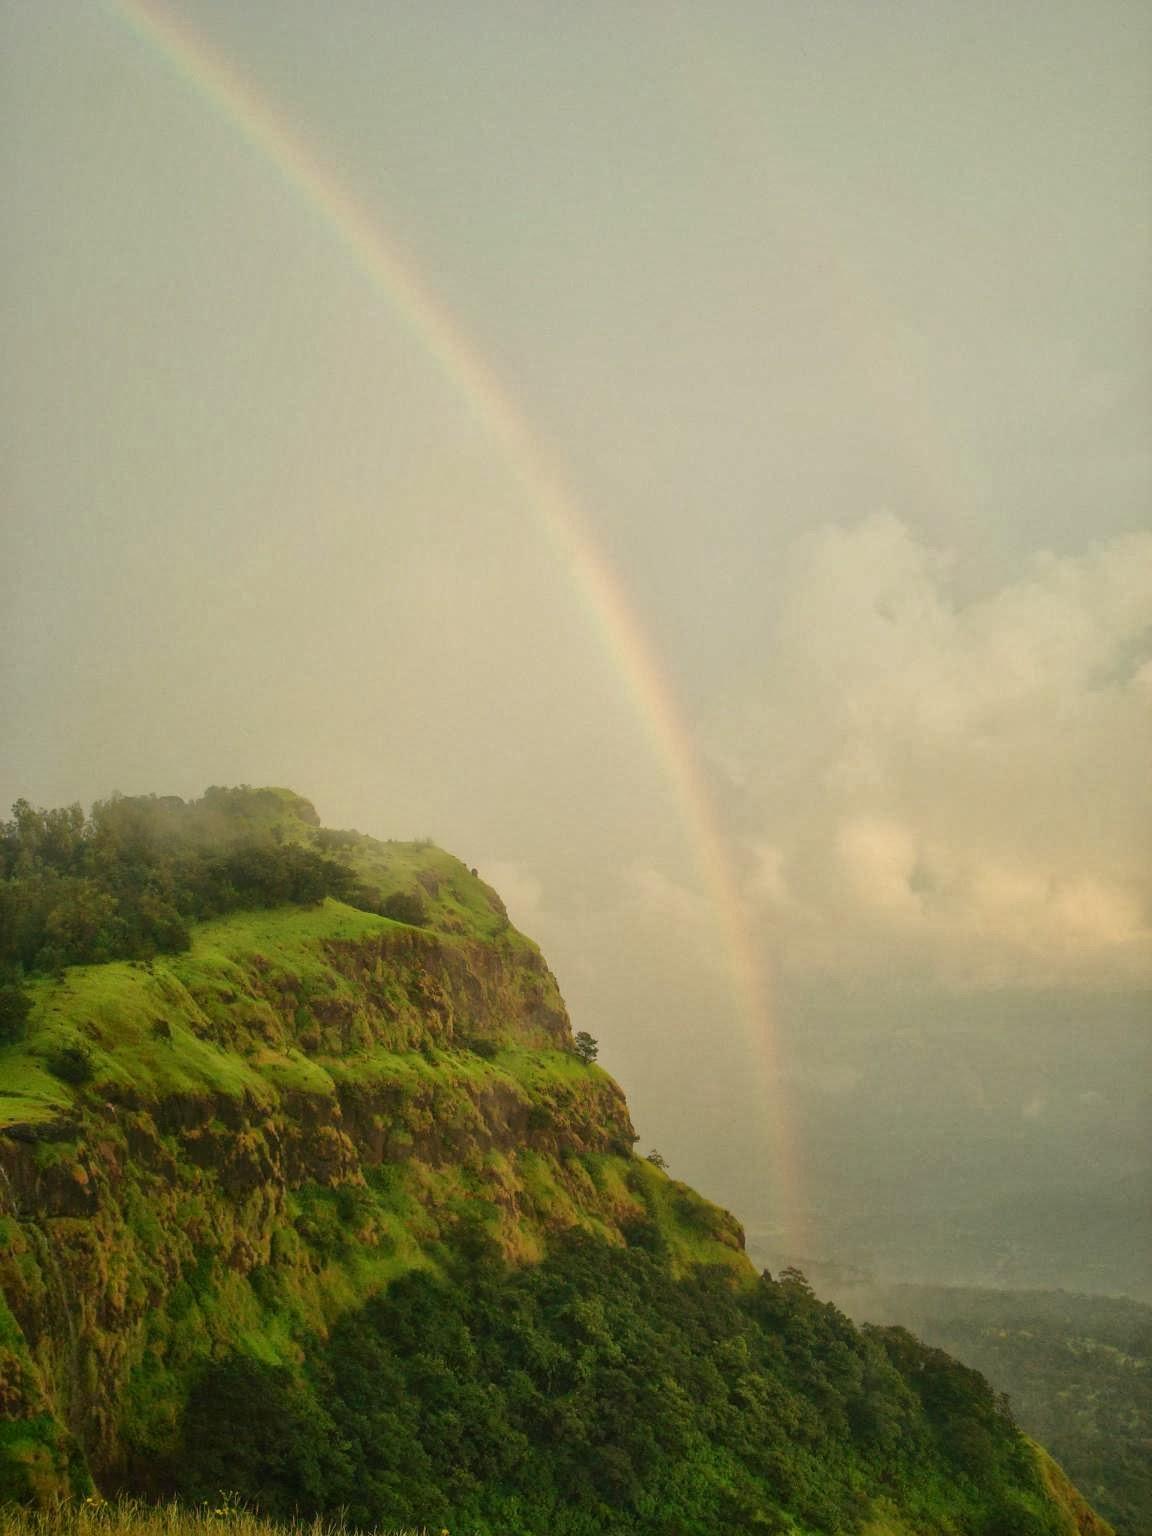 A rainbow @ Madhe ghat